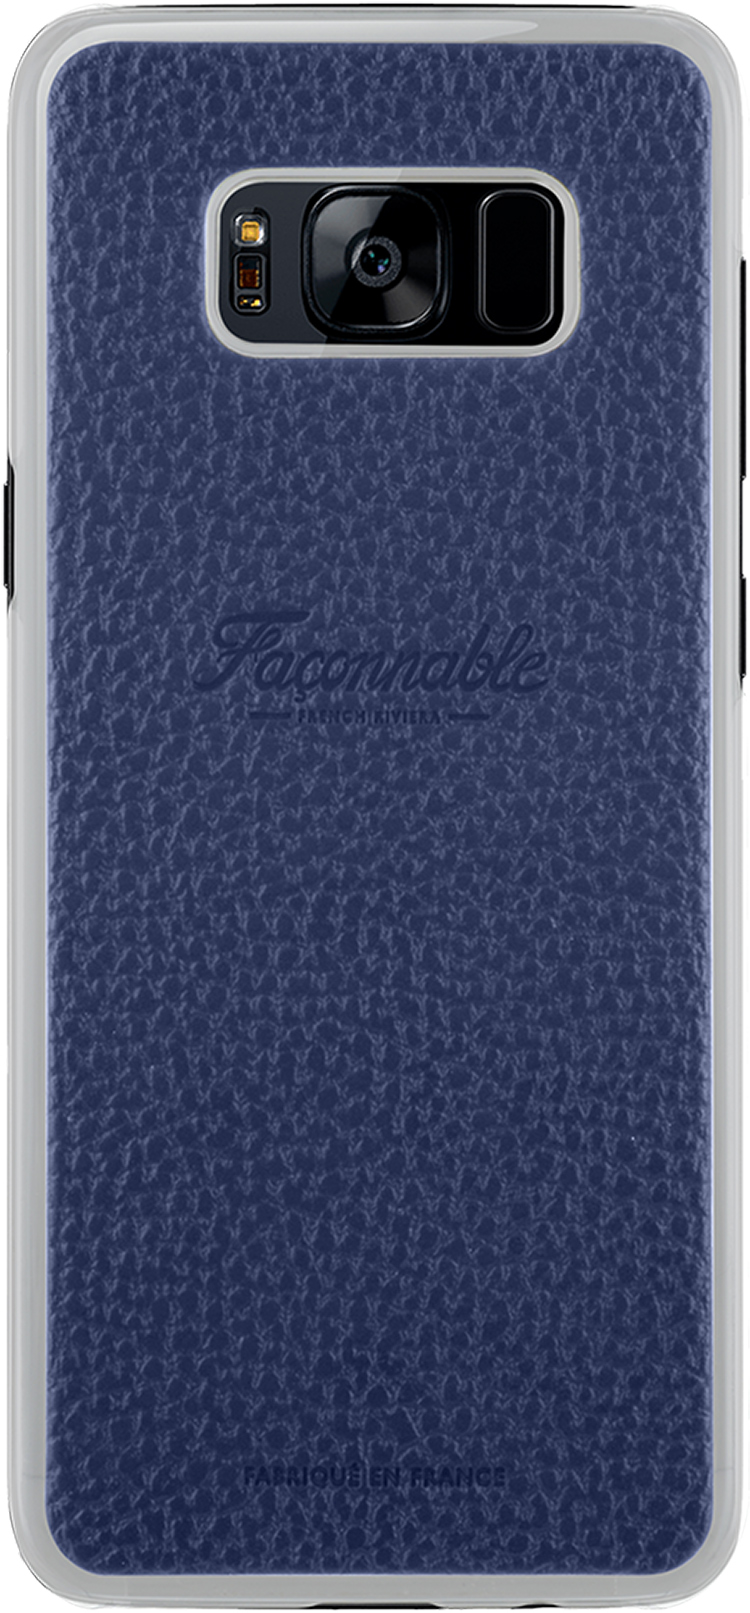 Coque rigide Façonnable French Riviera (Bleu) - Packshot